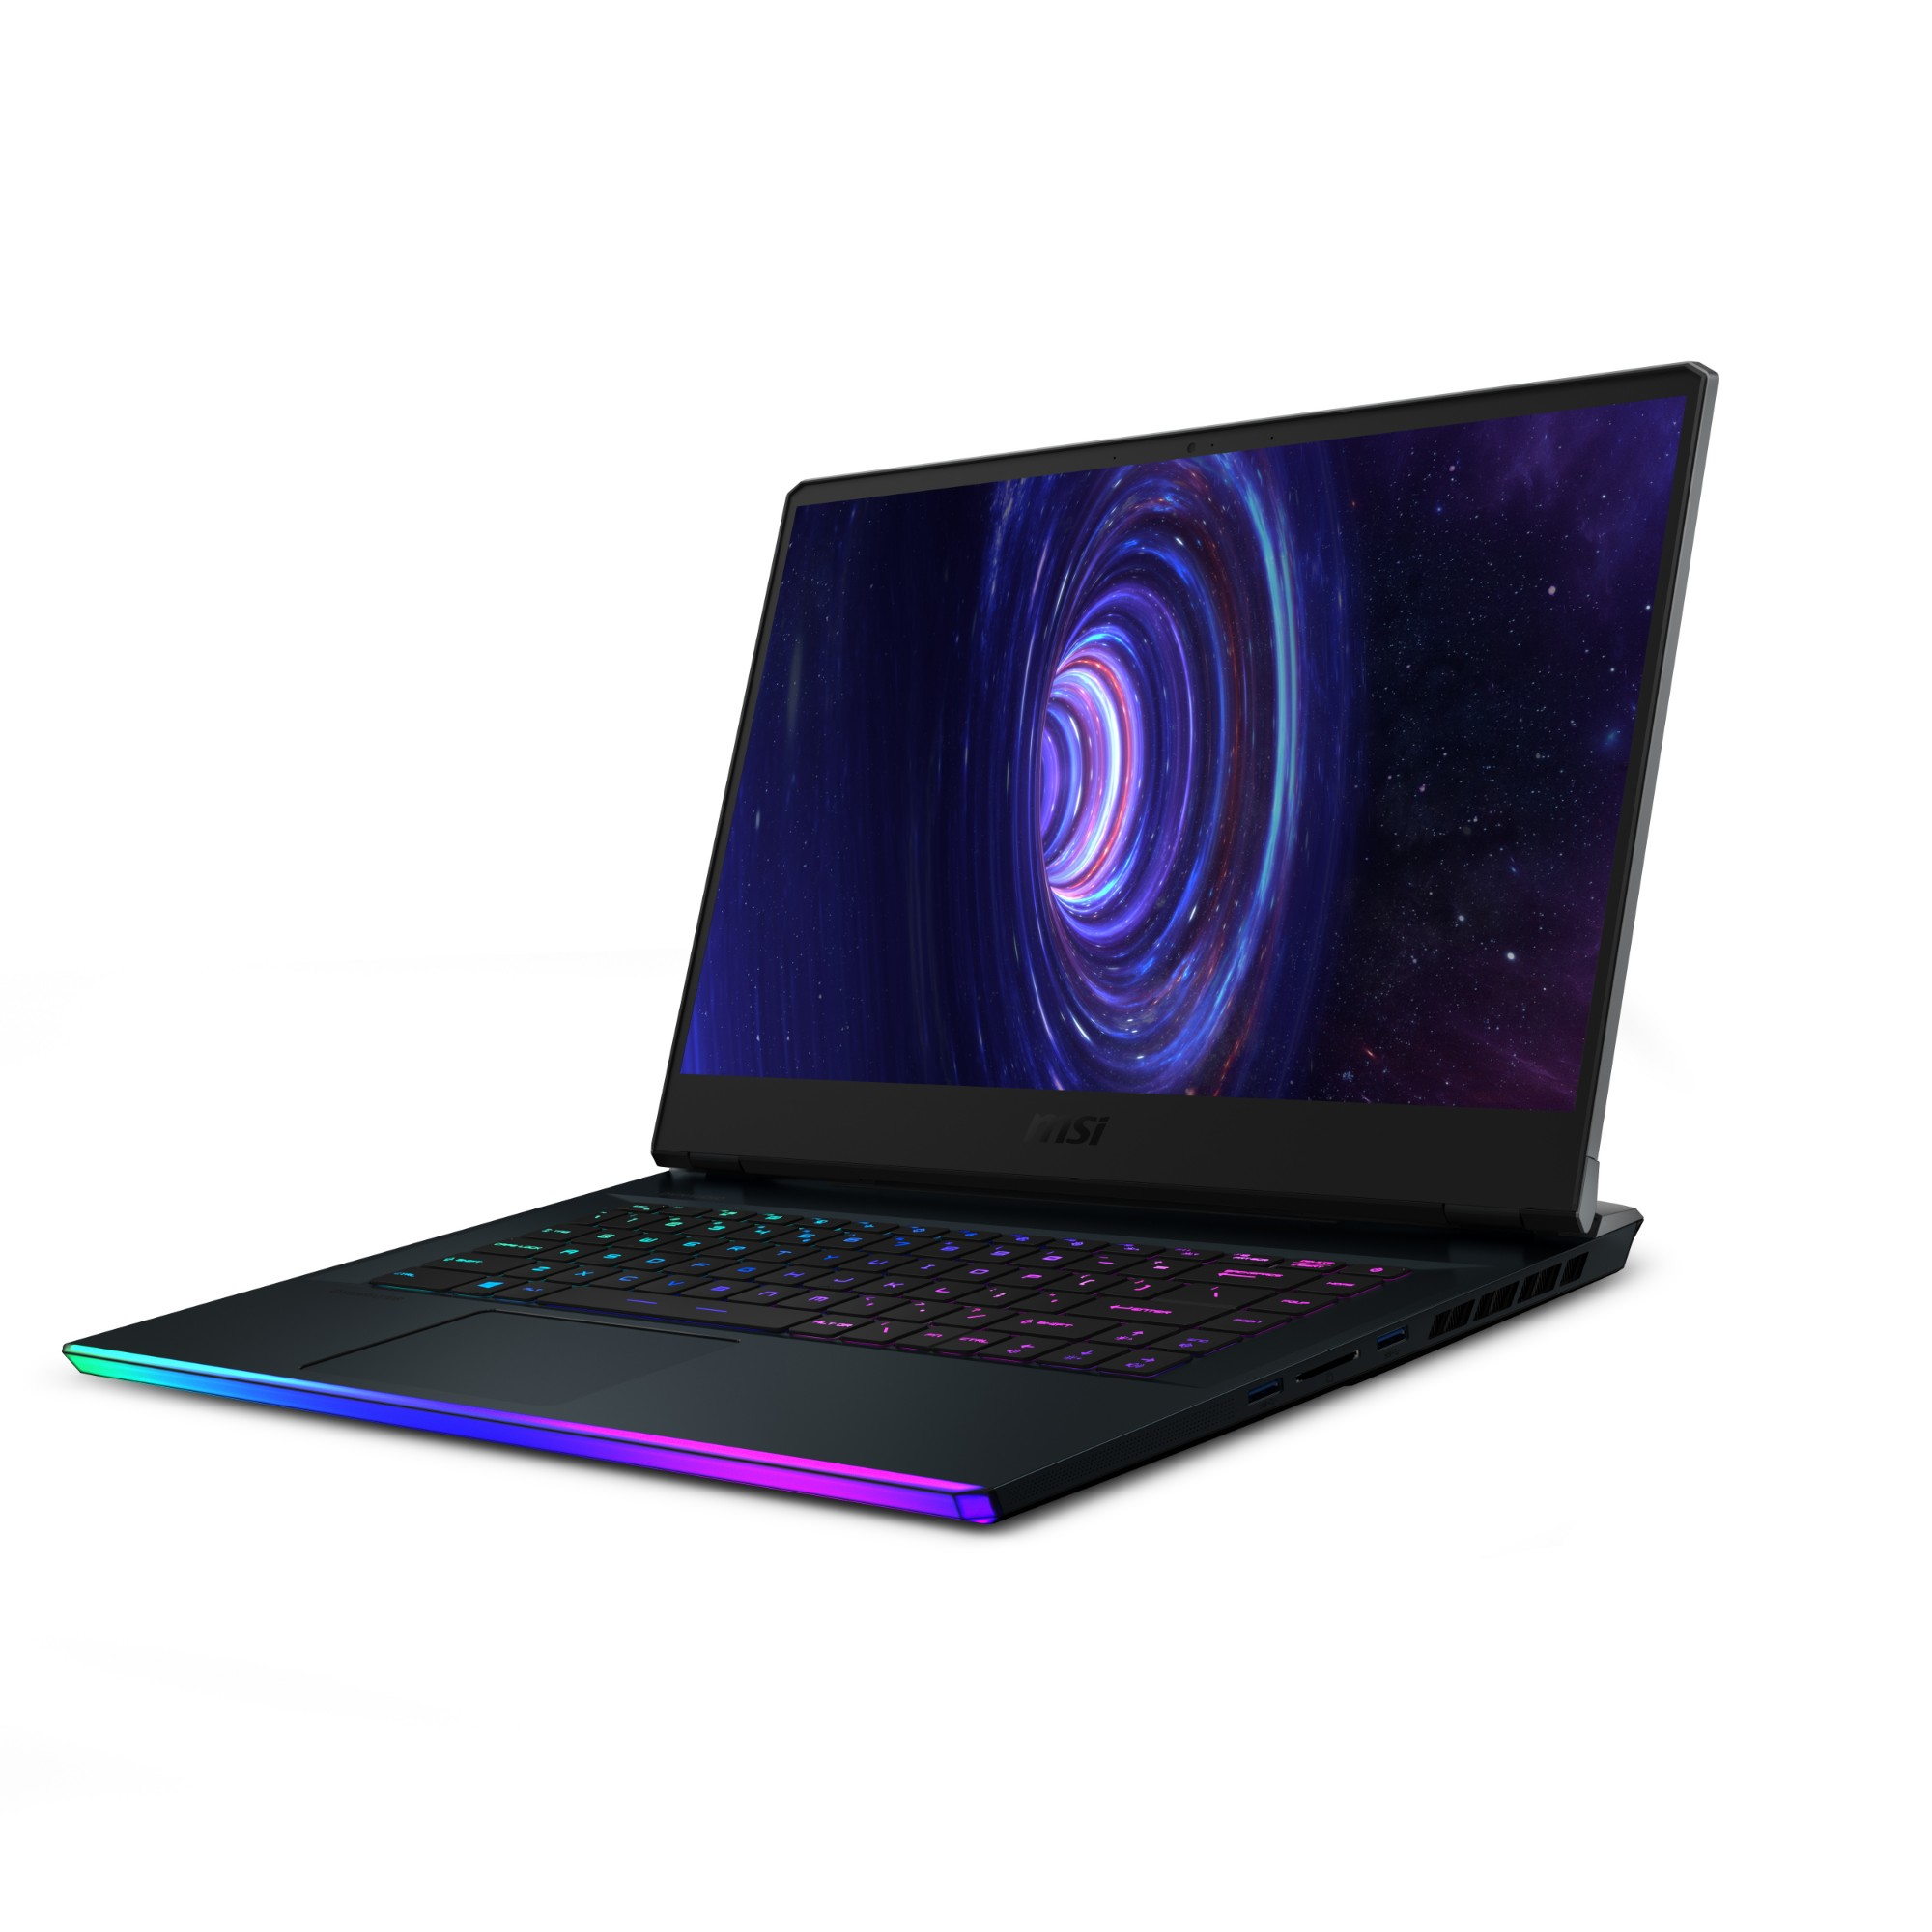 "MSI Gaming GE66 10SF-056XES Raider Portátil Negro, Gris 39,6 cm (15.6"") 1920 x 1080 Pixeles Intel® Core™ i7 de 10ma Generación 32 GB DDR4-SDRAM 1000 GB SSD NVIDIA® GeForce RTX™ 2070 Wi-Fi 6 (802.11ax)"